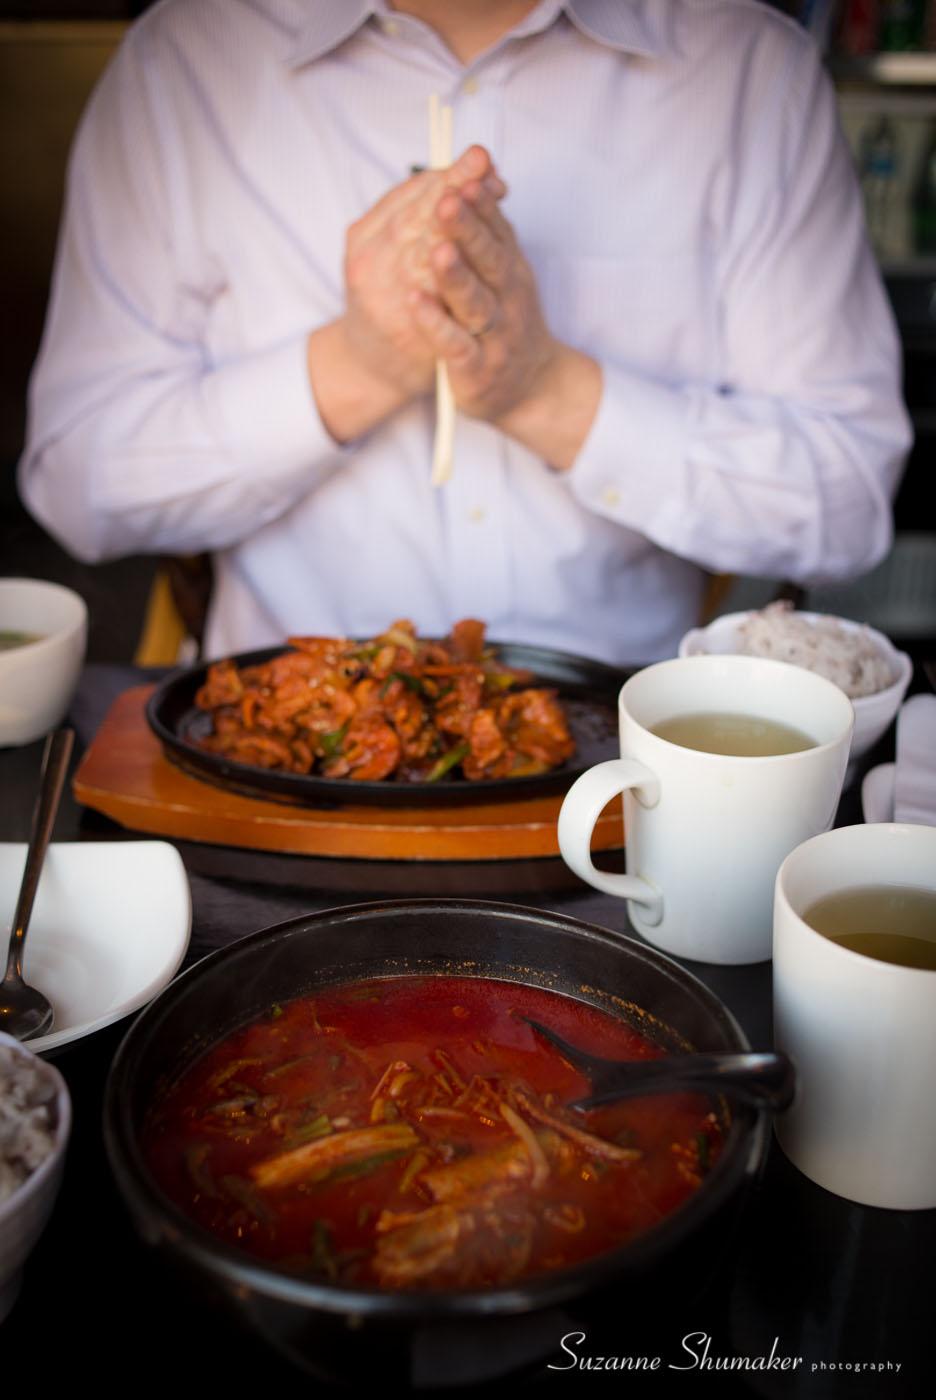 My hot lunch date #yukgaejangsoup